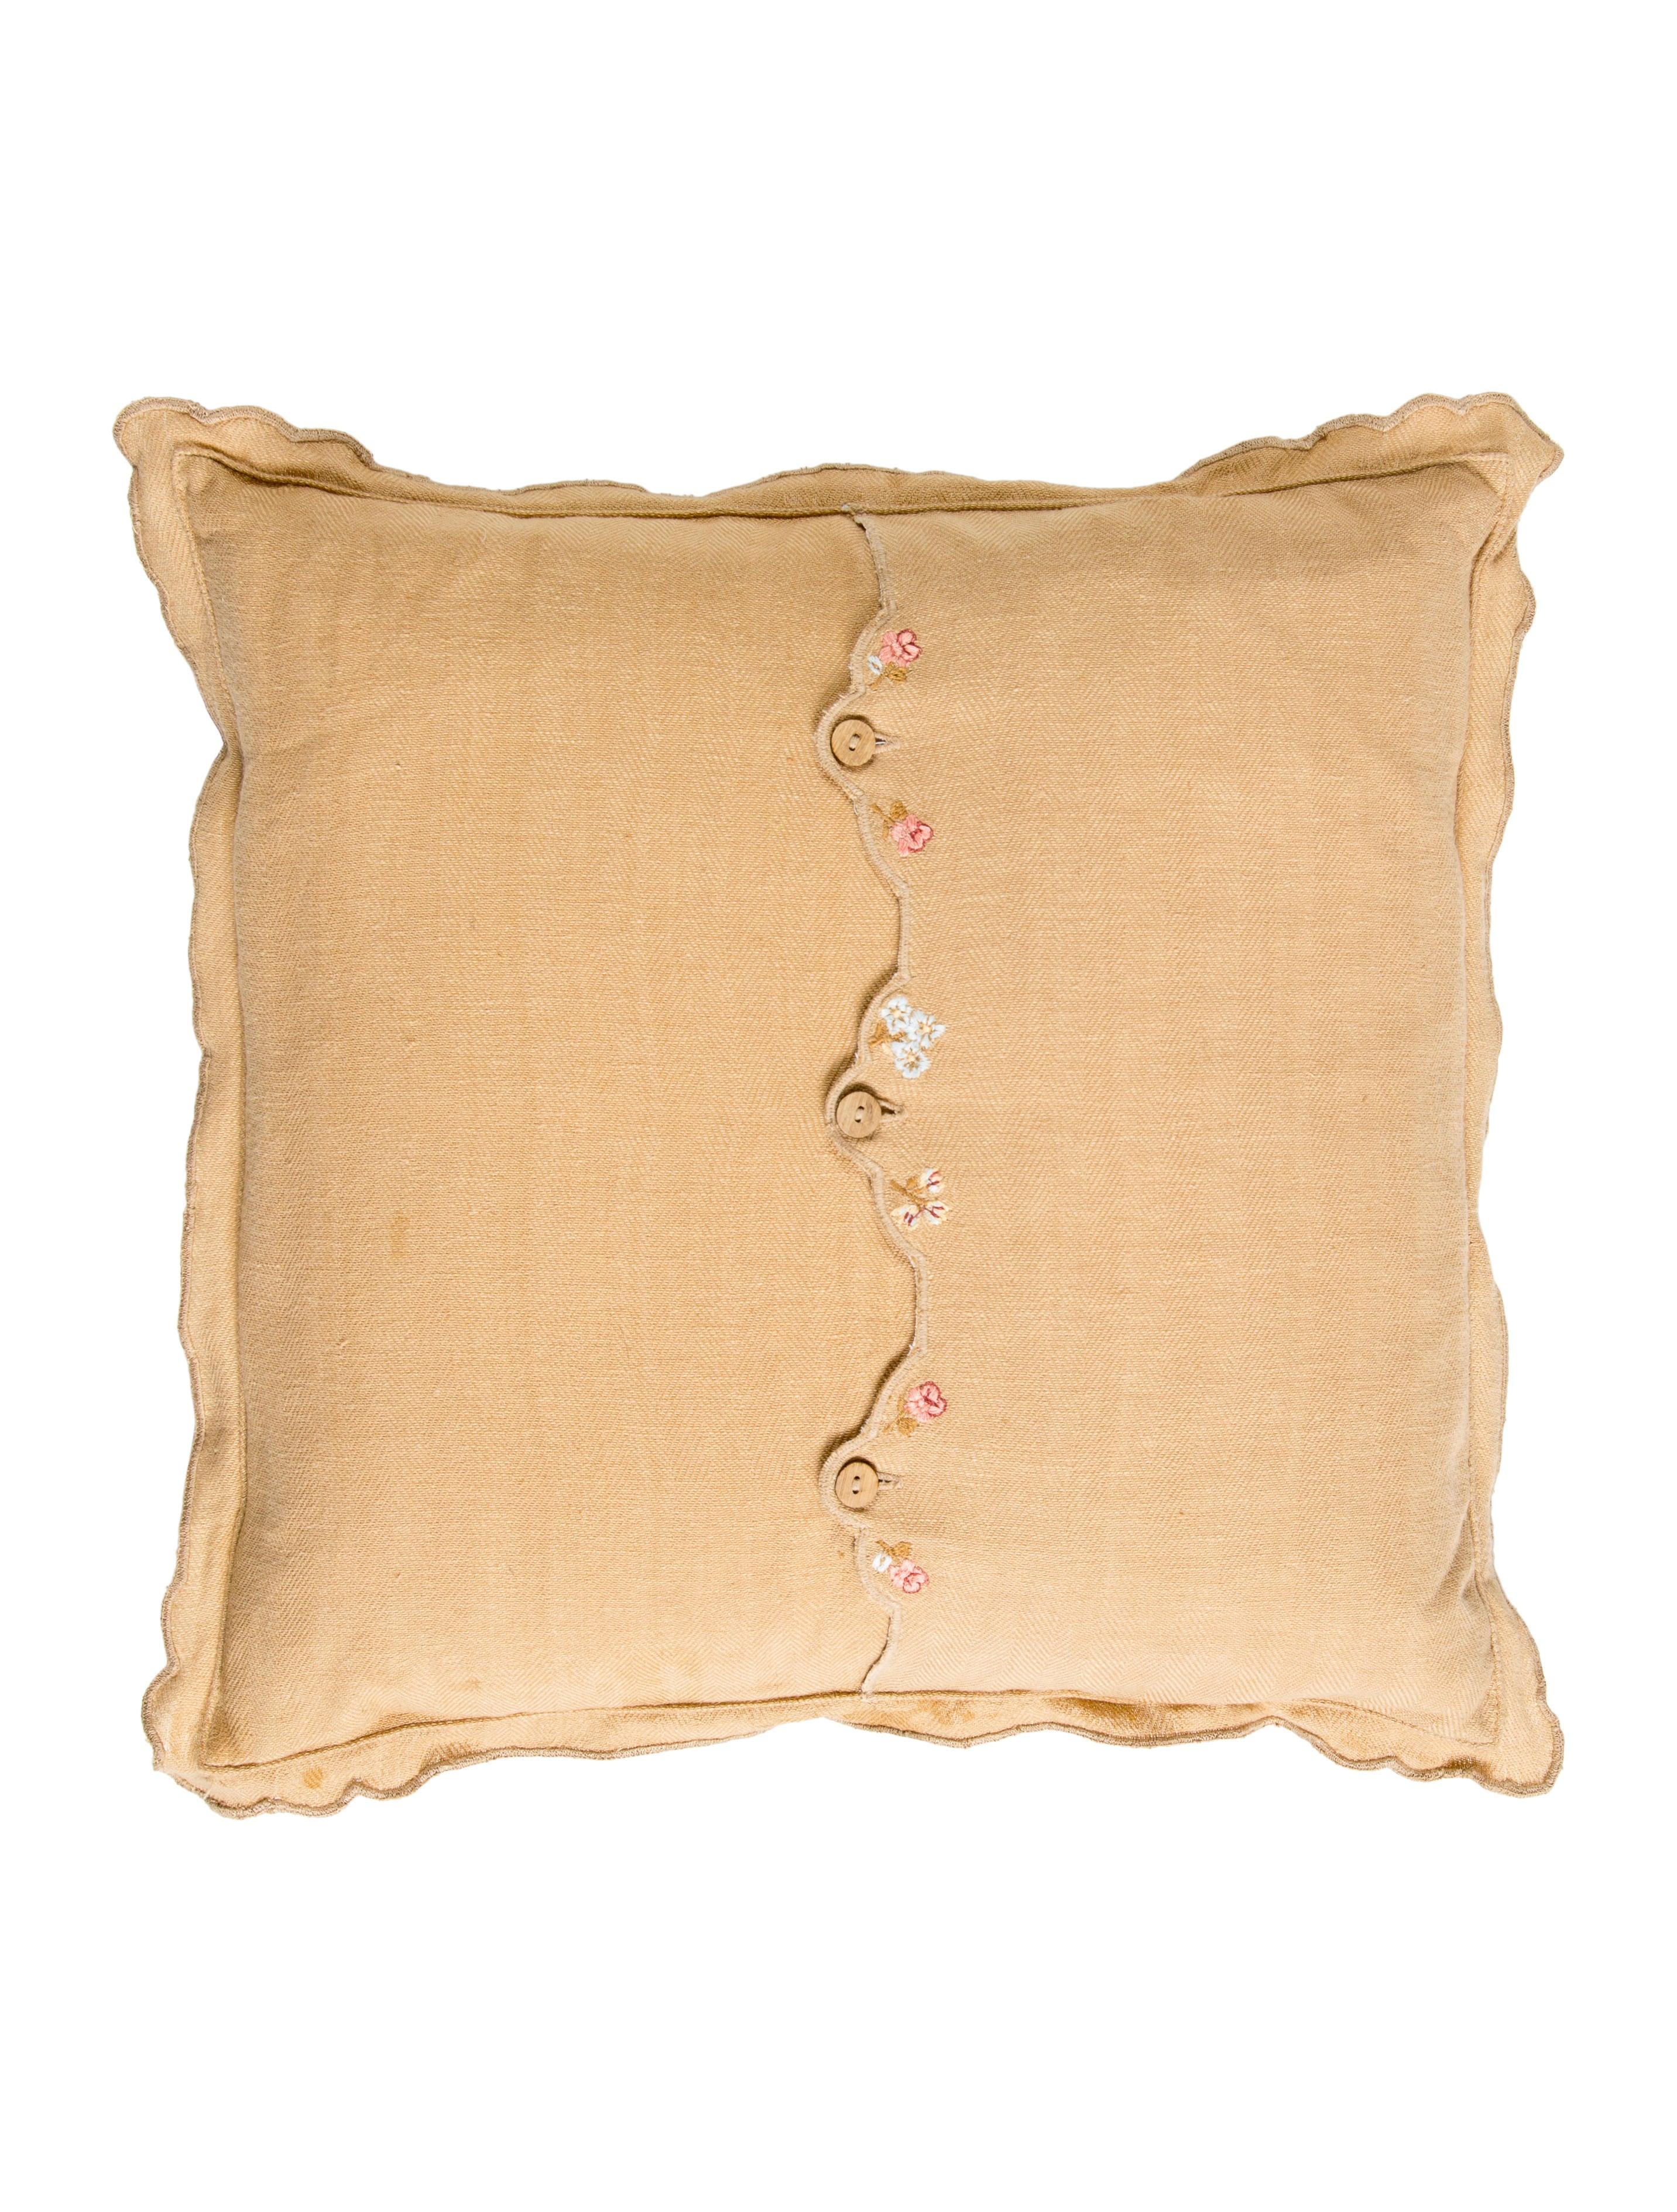 Ralph Lauren Assorted Throw Pillows - Bedding And Bath - WYG22124 The RealReal